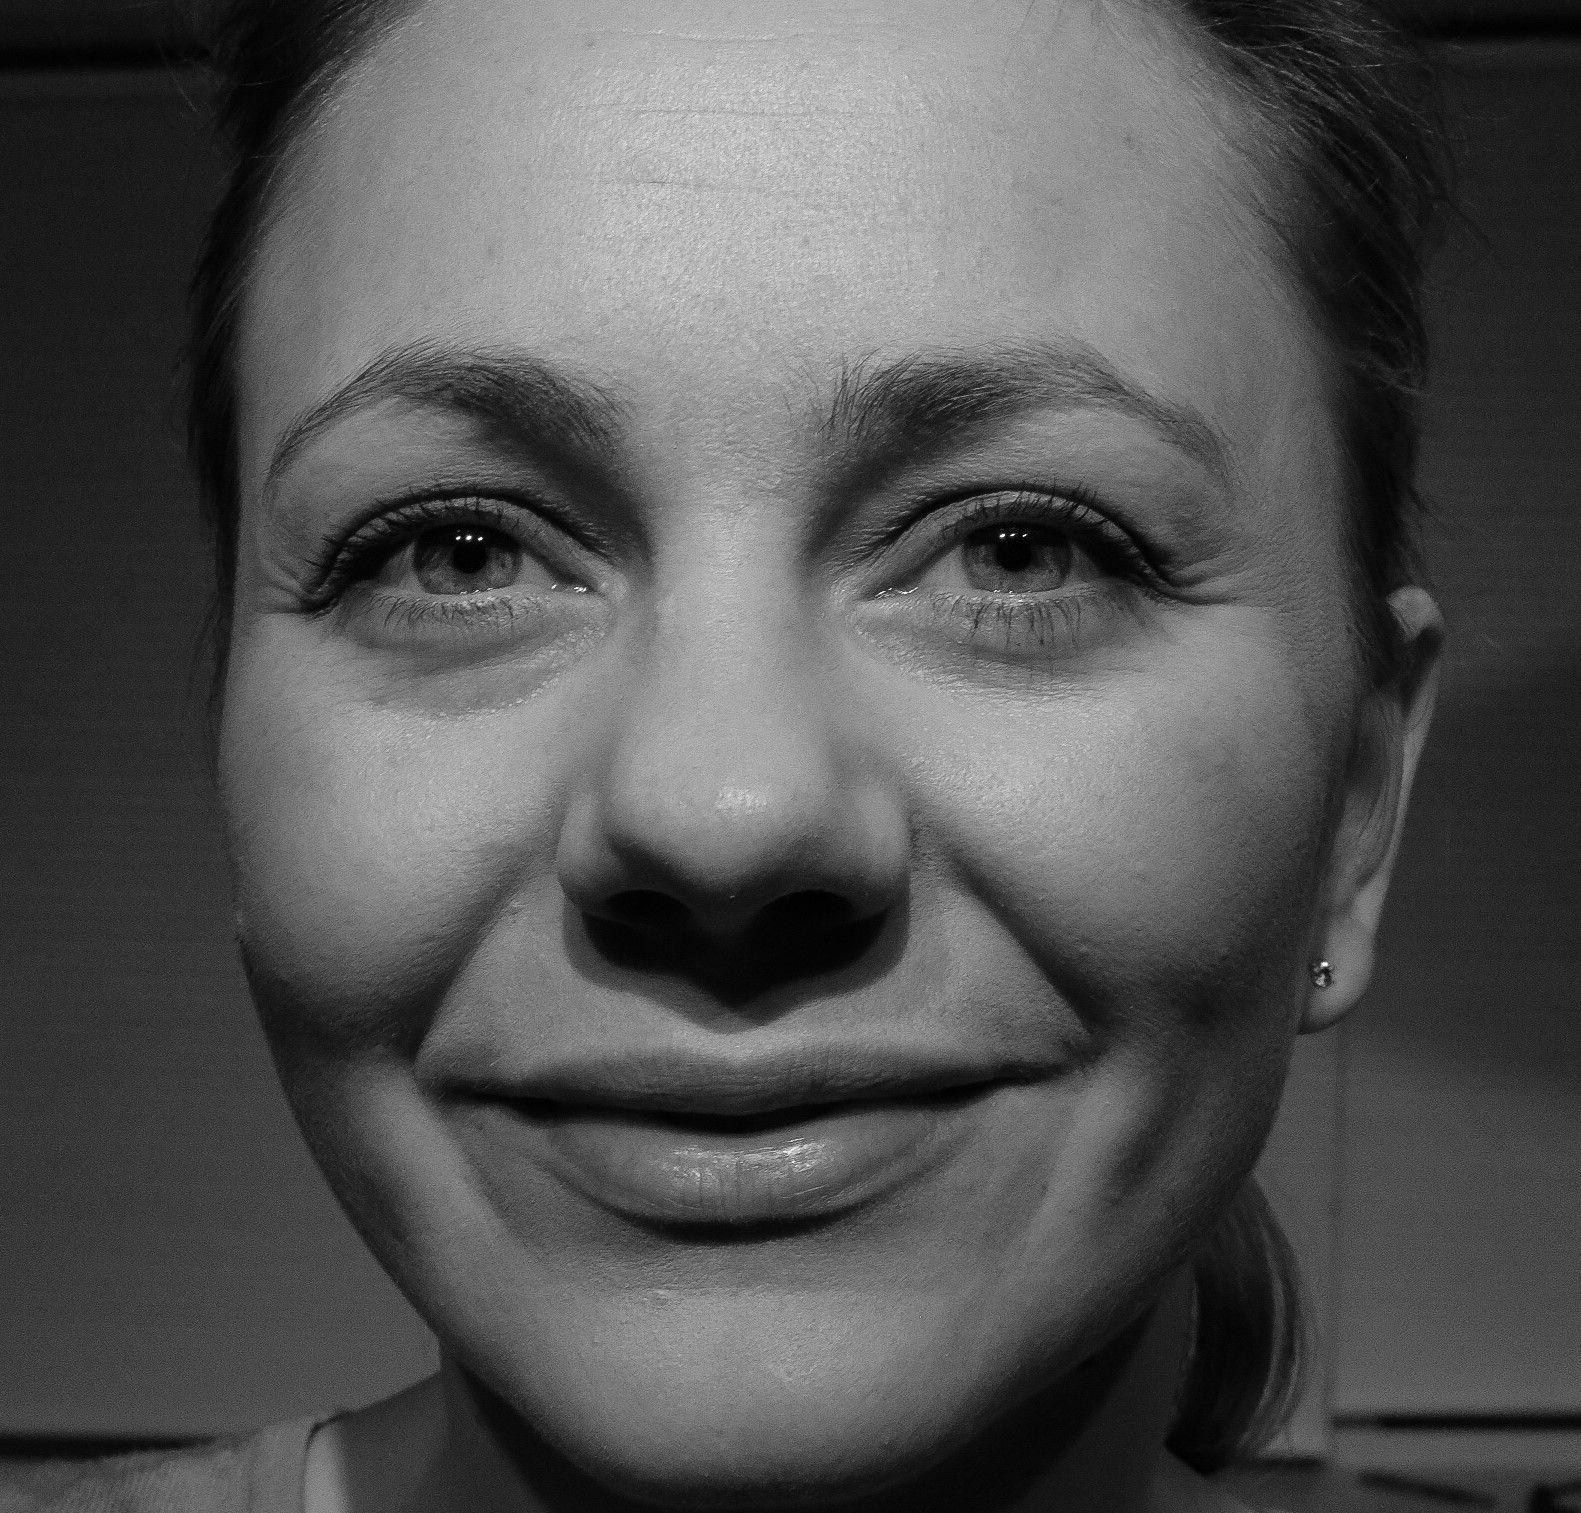 Julia Brox Skarnes